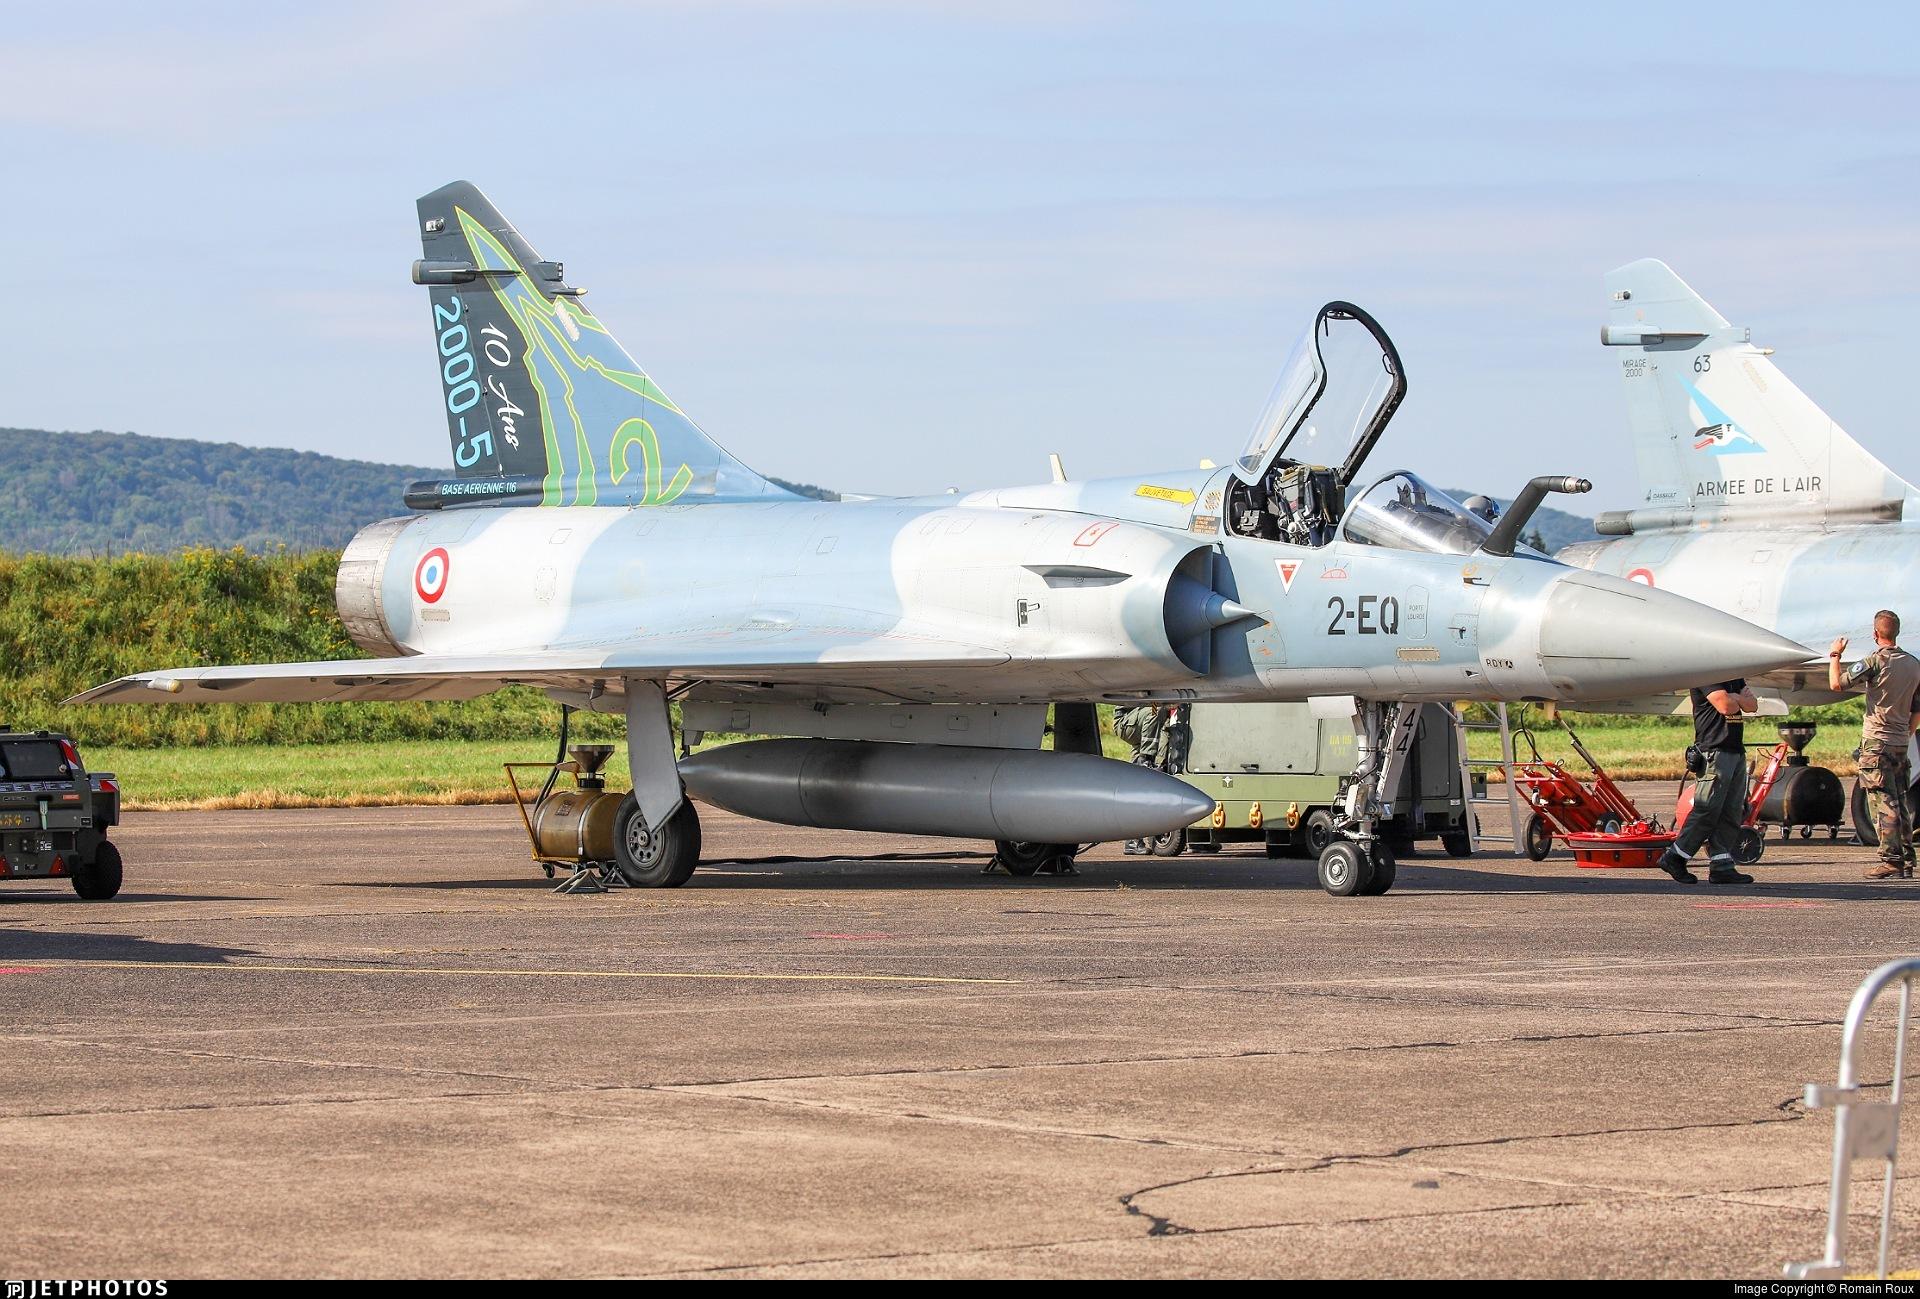 44 - Dassault Mirage 2000-5F - France - Air Force